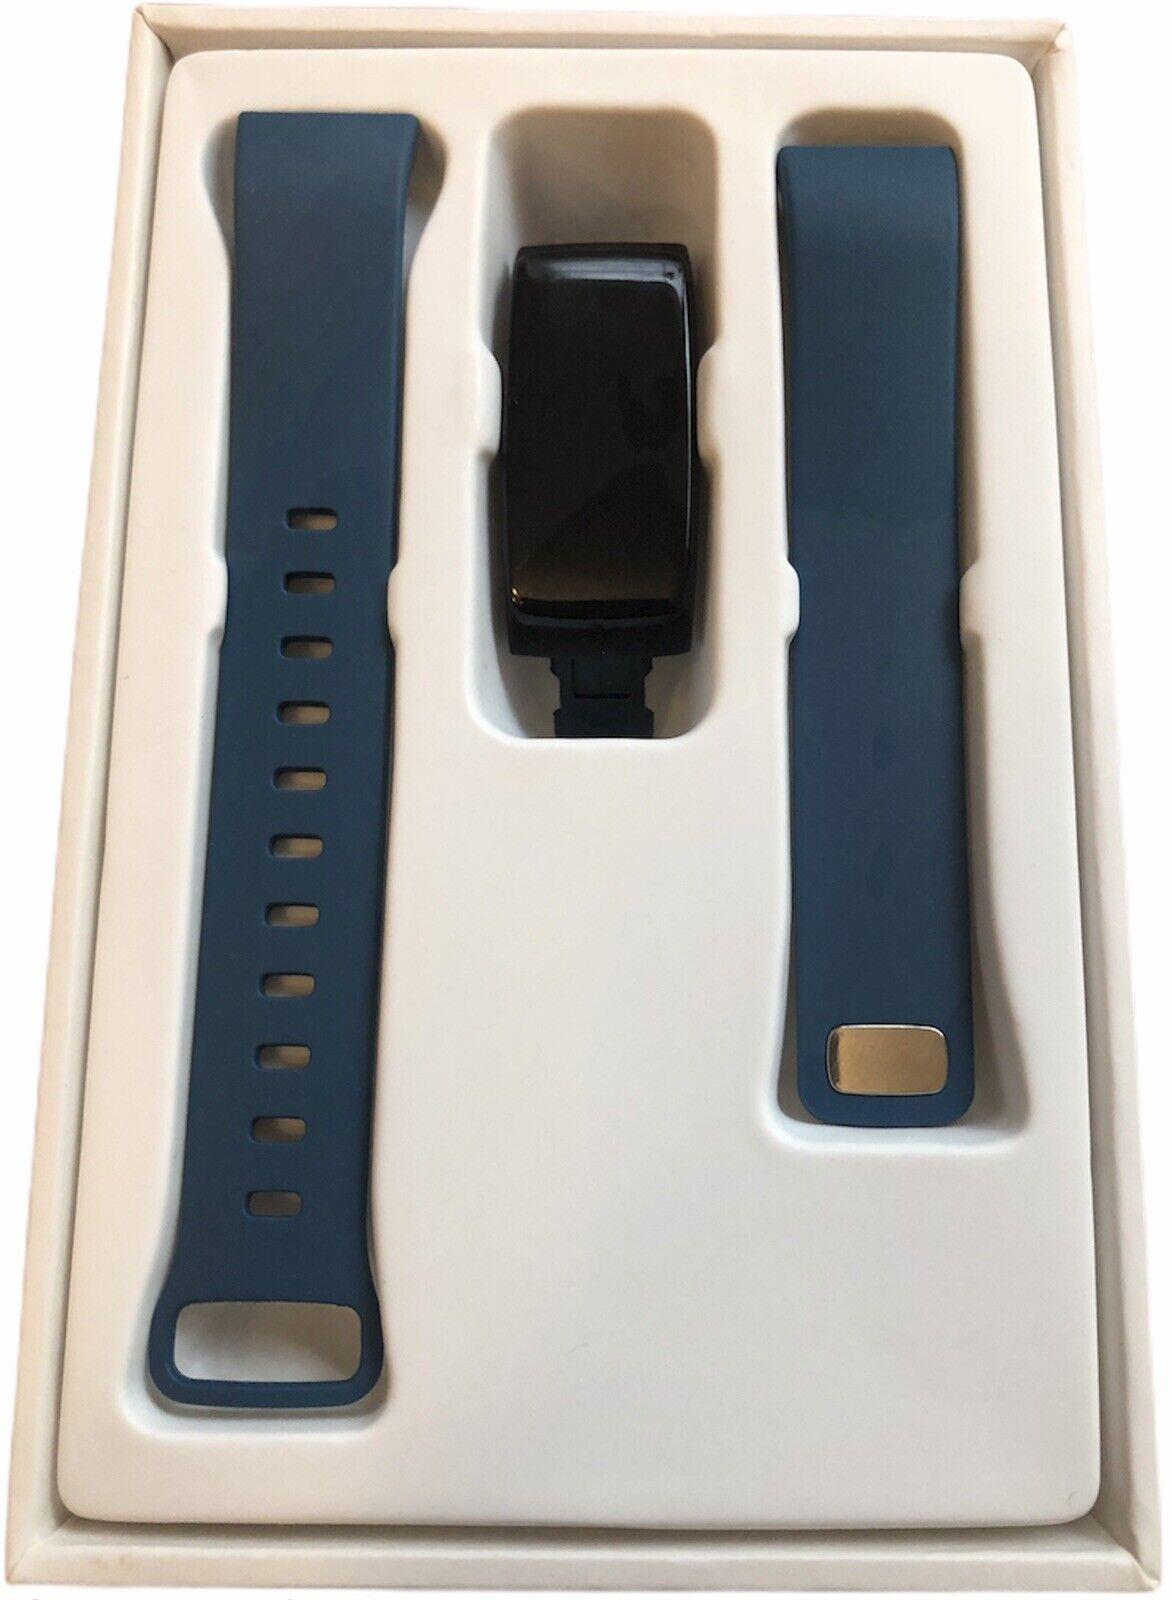 TechComm V5 Fitness Smart Watch Heart Rate Sleep Monitor Step Tracker Blue NEW Featured fitness heart monitor rate sleep smart step techcomm tracker watch